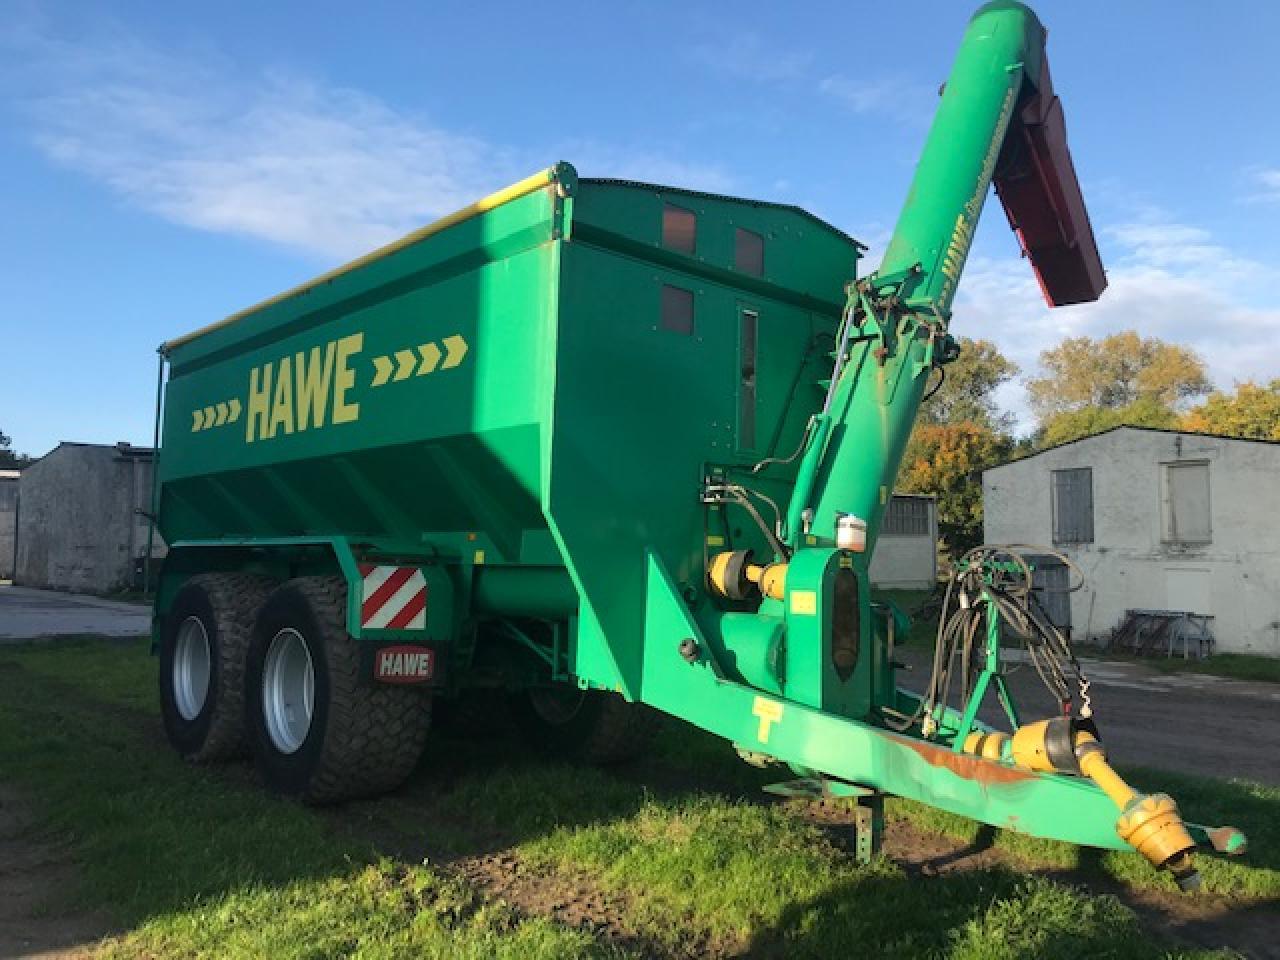 HAWE ULW 2500 T